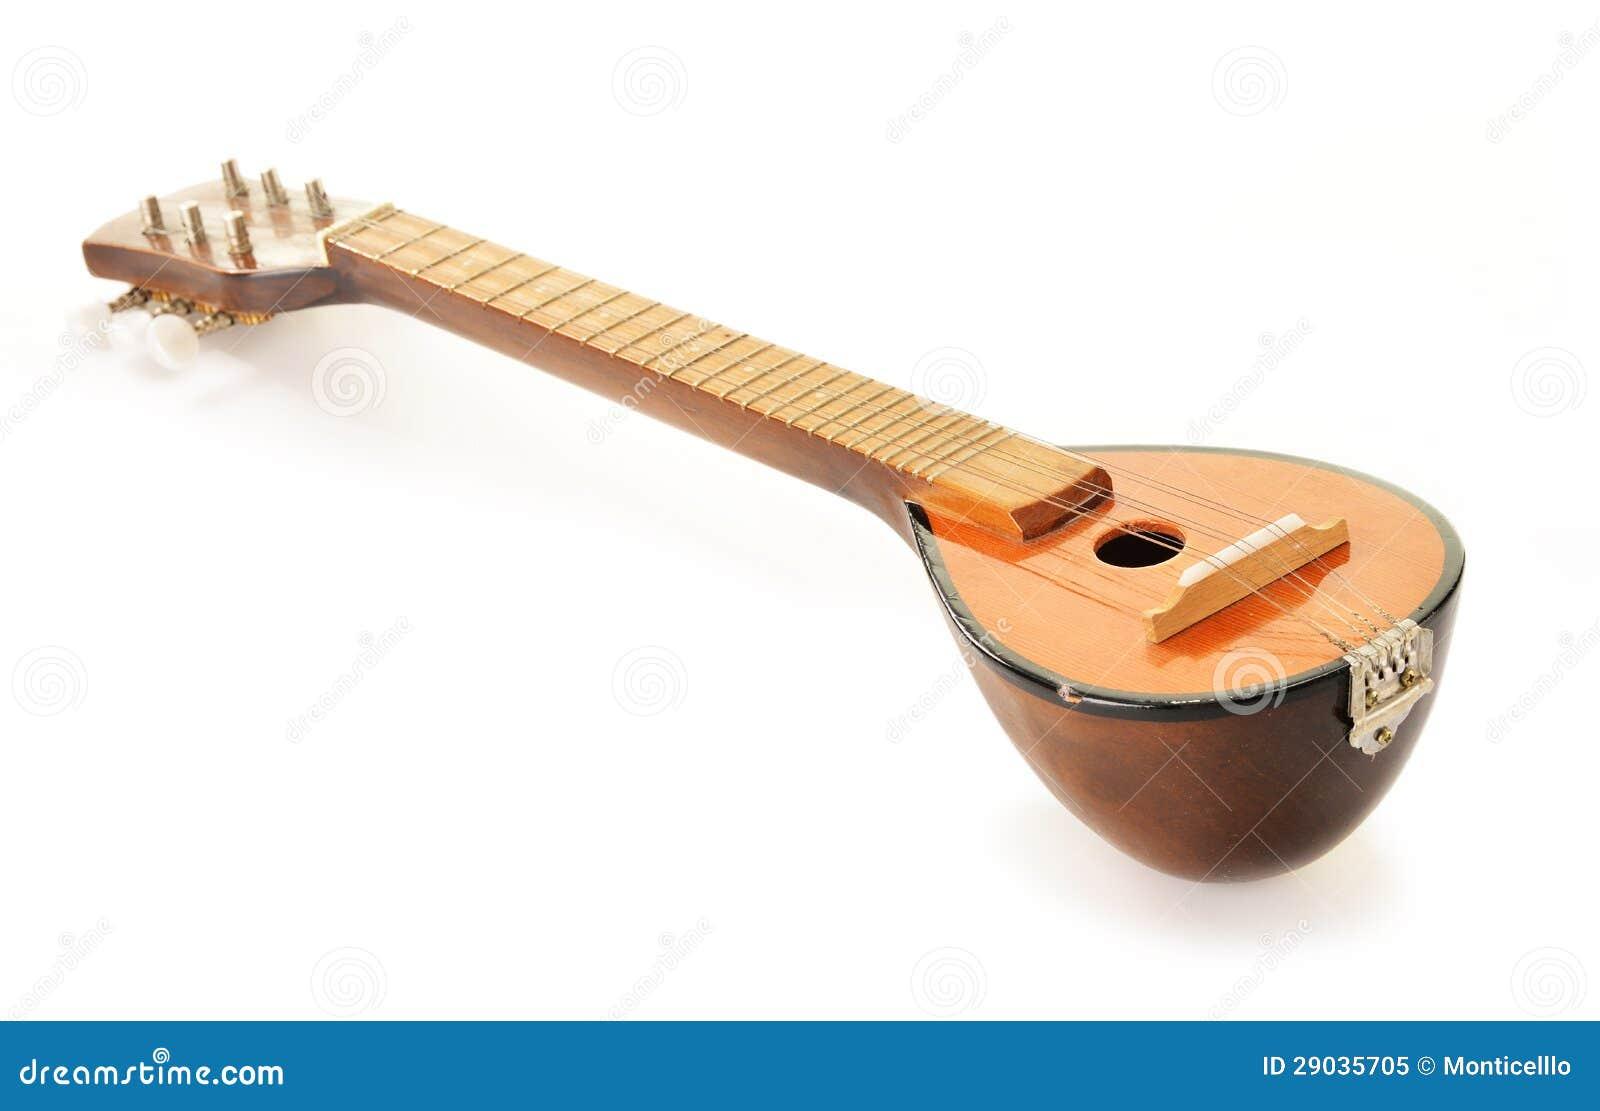 Musical Instruments Clipart   Chadholtz